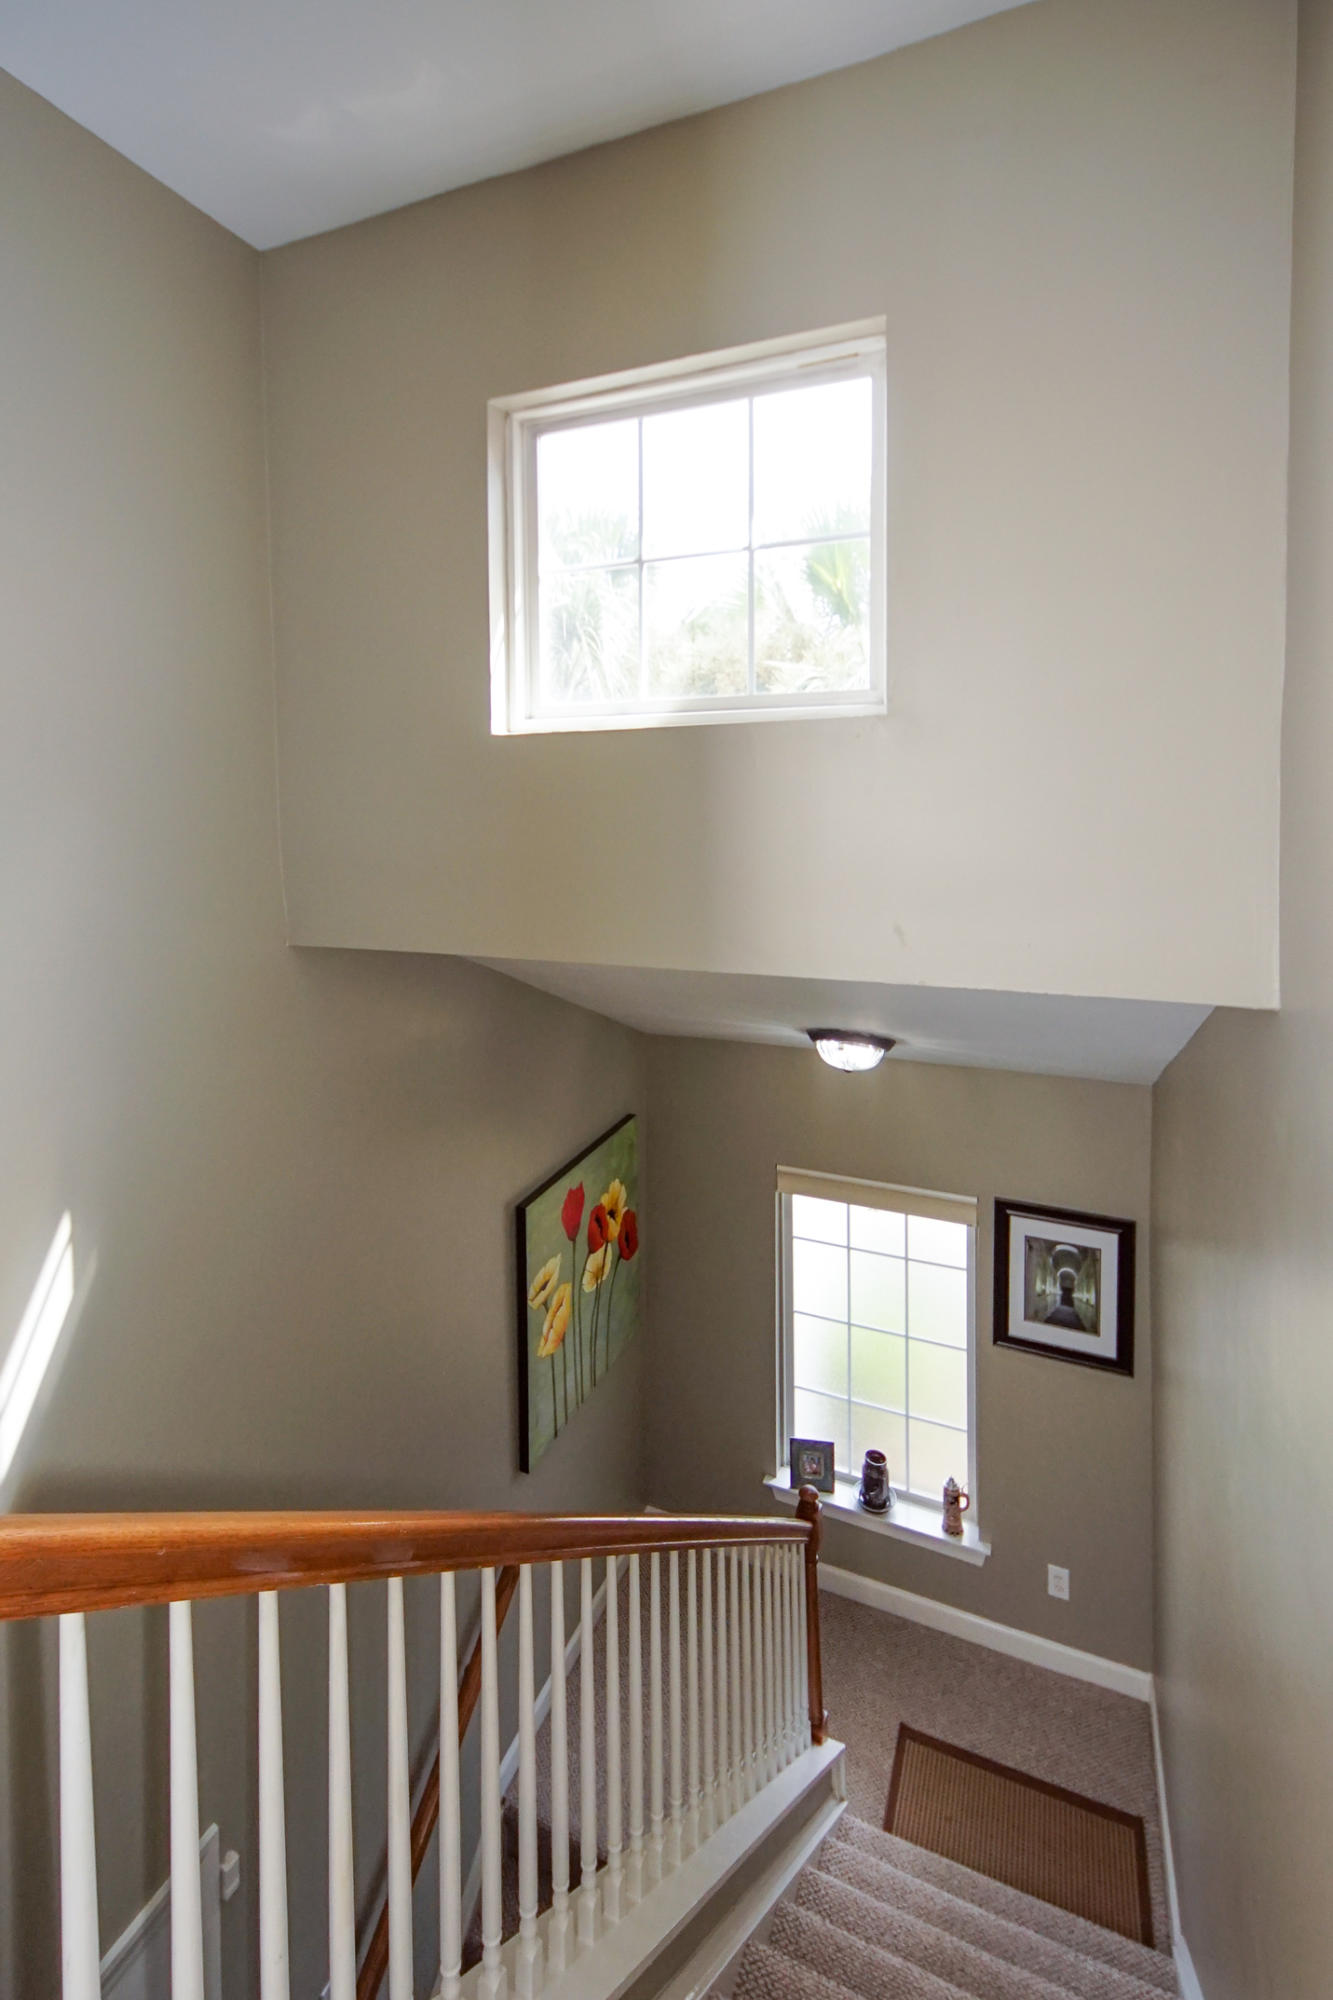 Dunes West Homes For Sale - 1631 Camfield, Mount Pleasant, SC - 11